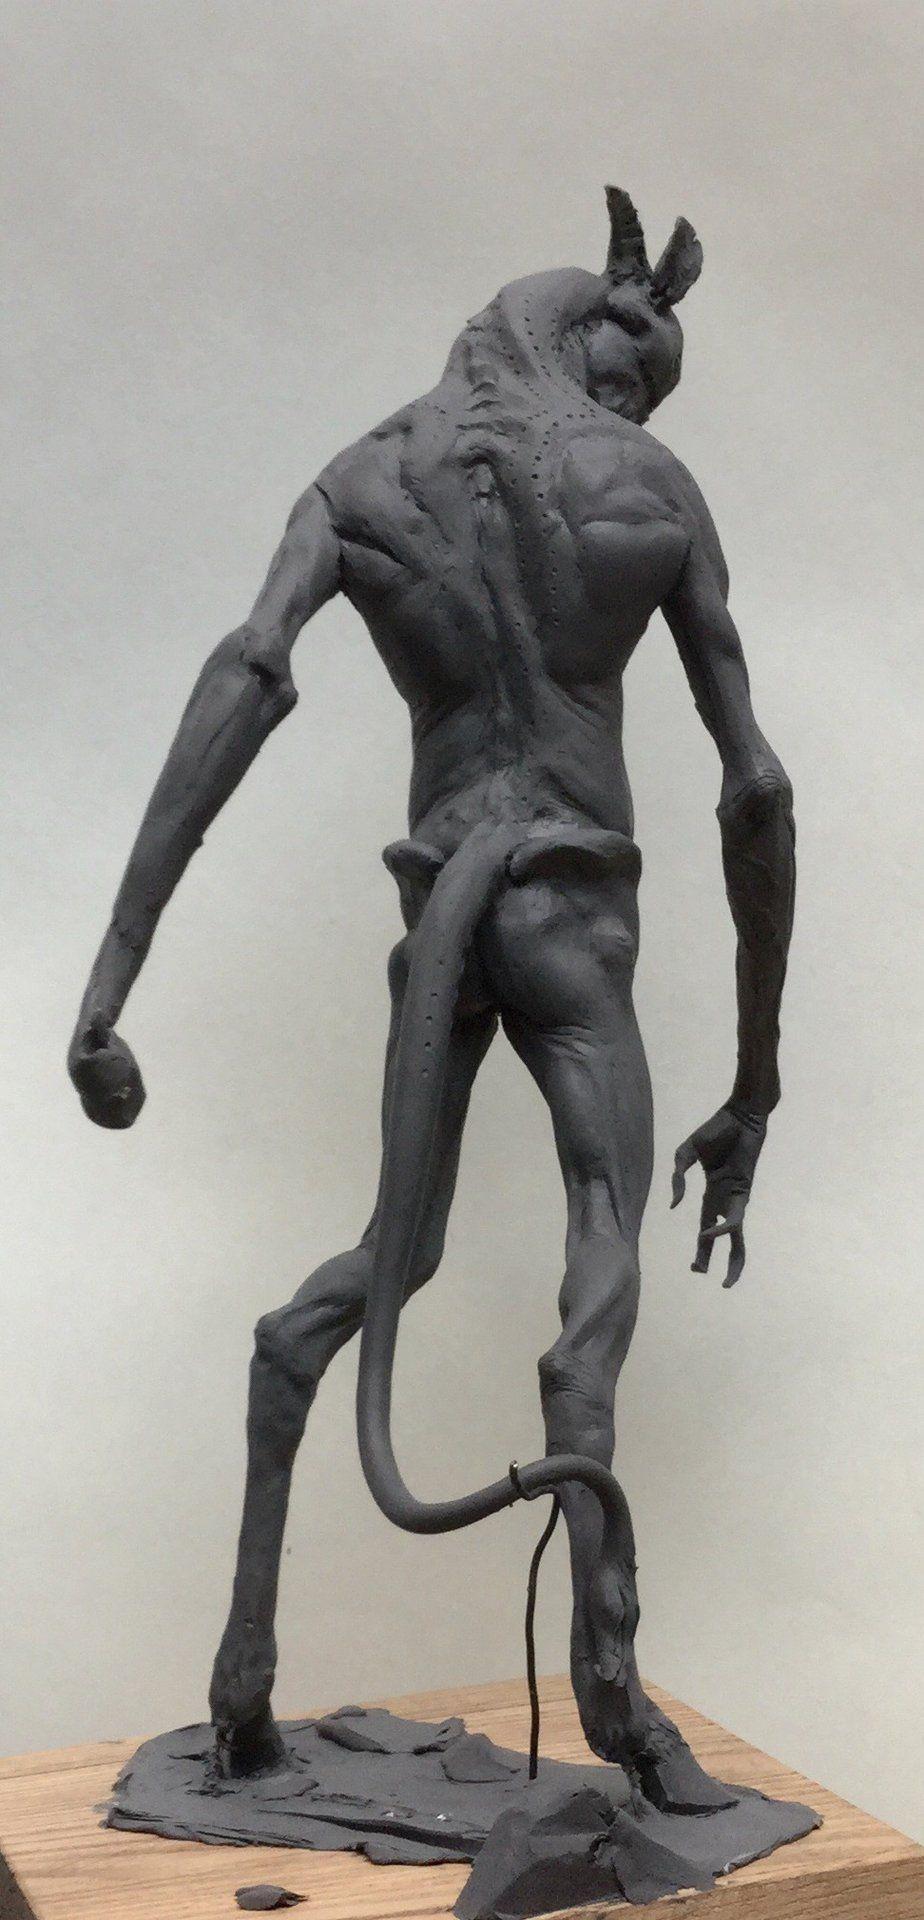 ArtStation - Monster sketch , Tomek Radziewicz